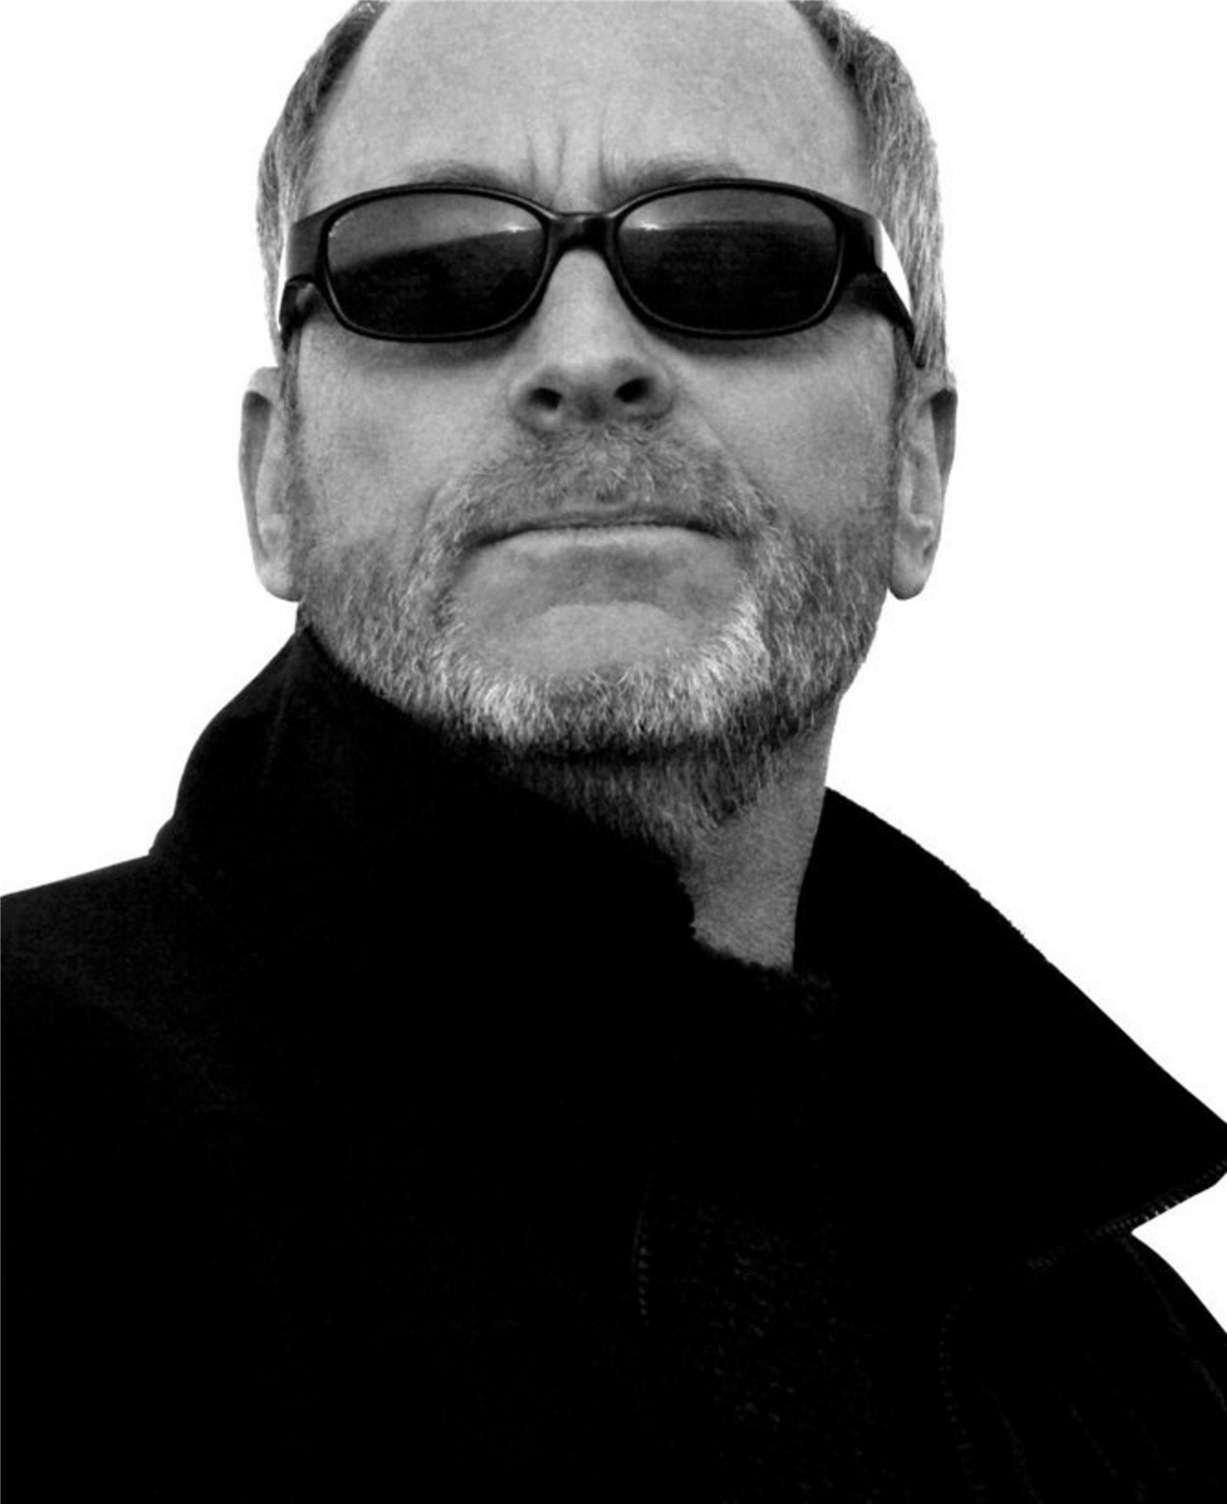 - портрет фотографа Грега Гормана / Greg Gorman